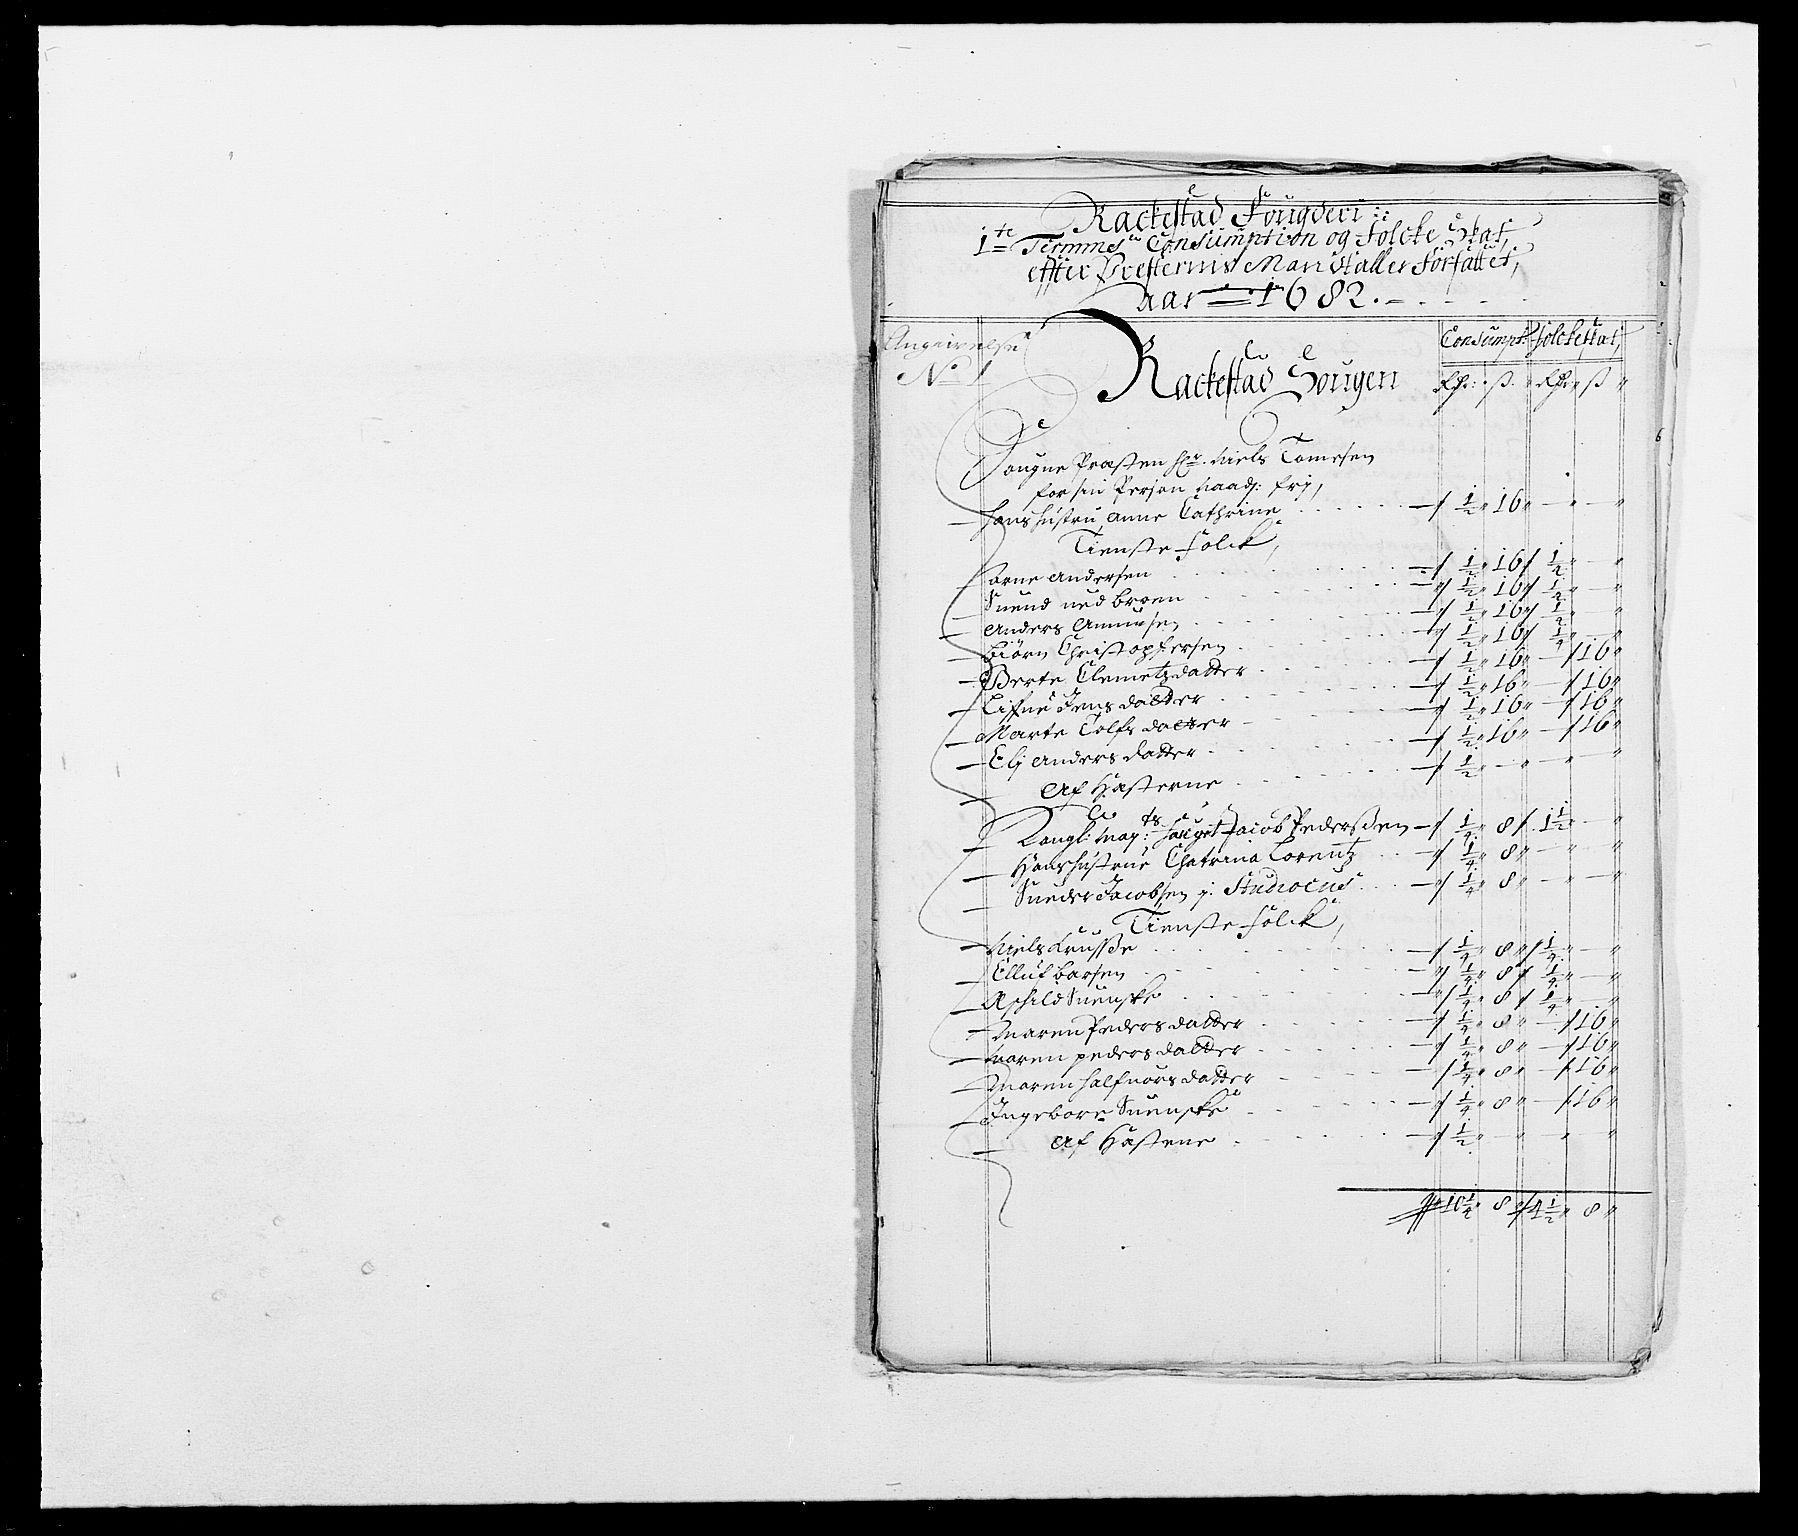 RA, Rentekammeret inntil 1814, Reviderte regnskaper, Fogderegnskap, R05/L0273: Fogderegnskap Rakkestad, 1682, s. 102